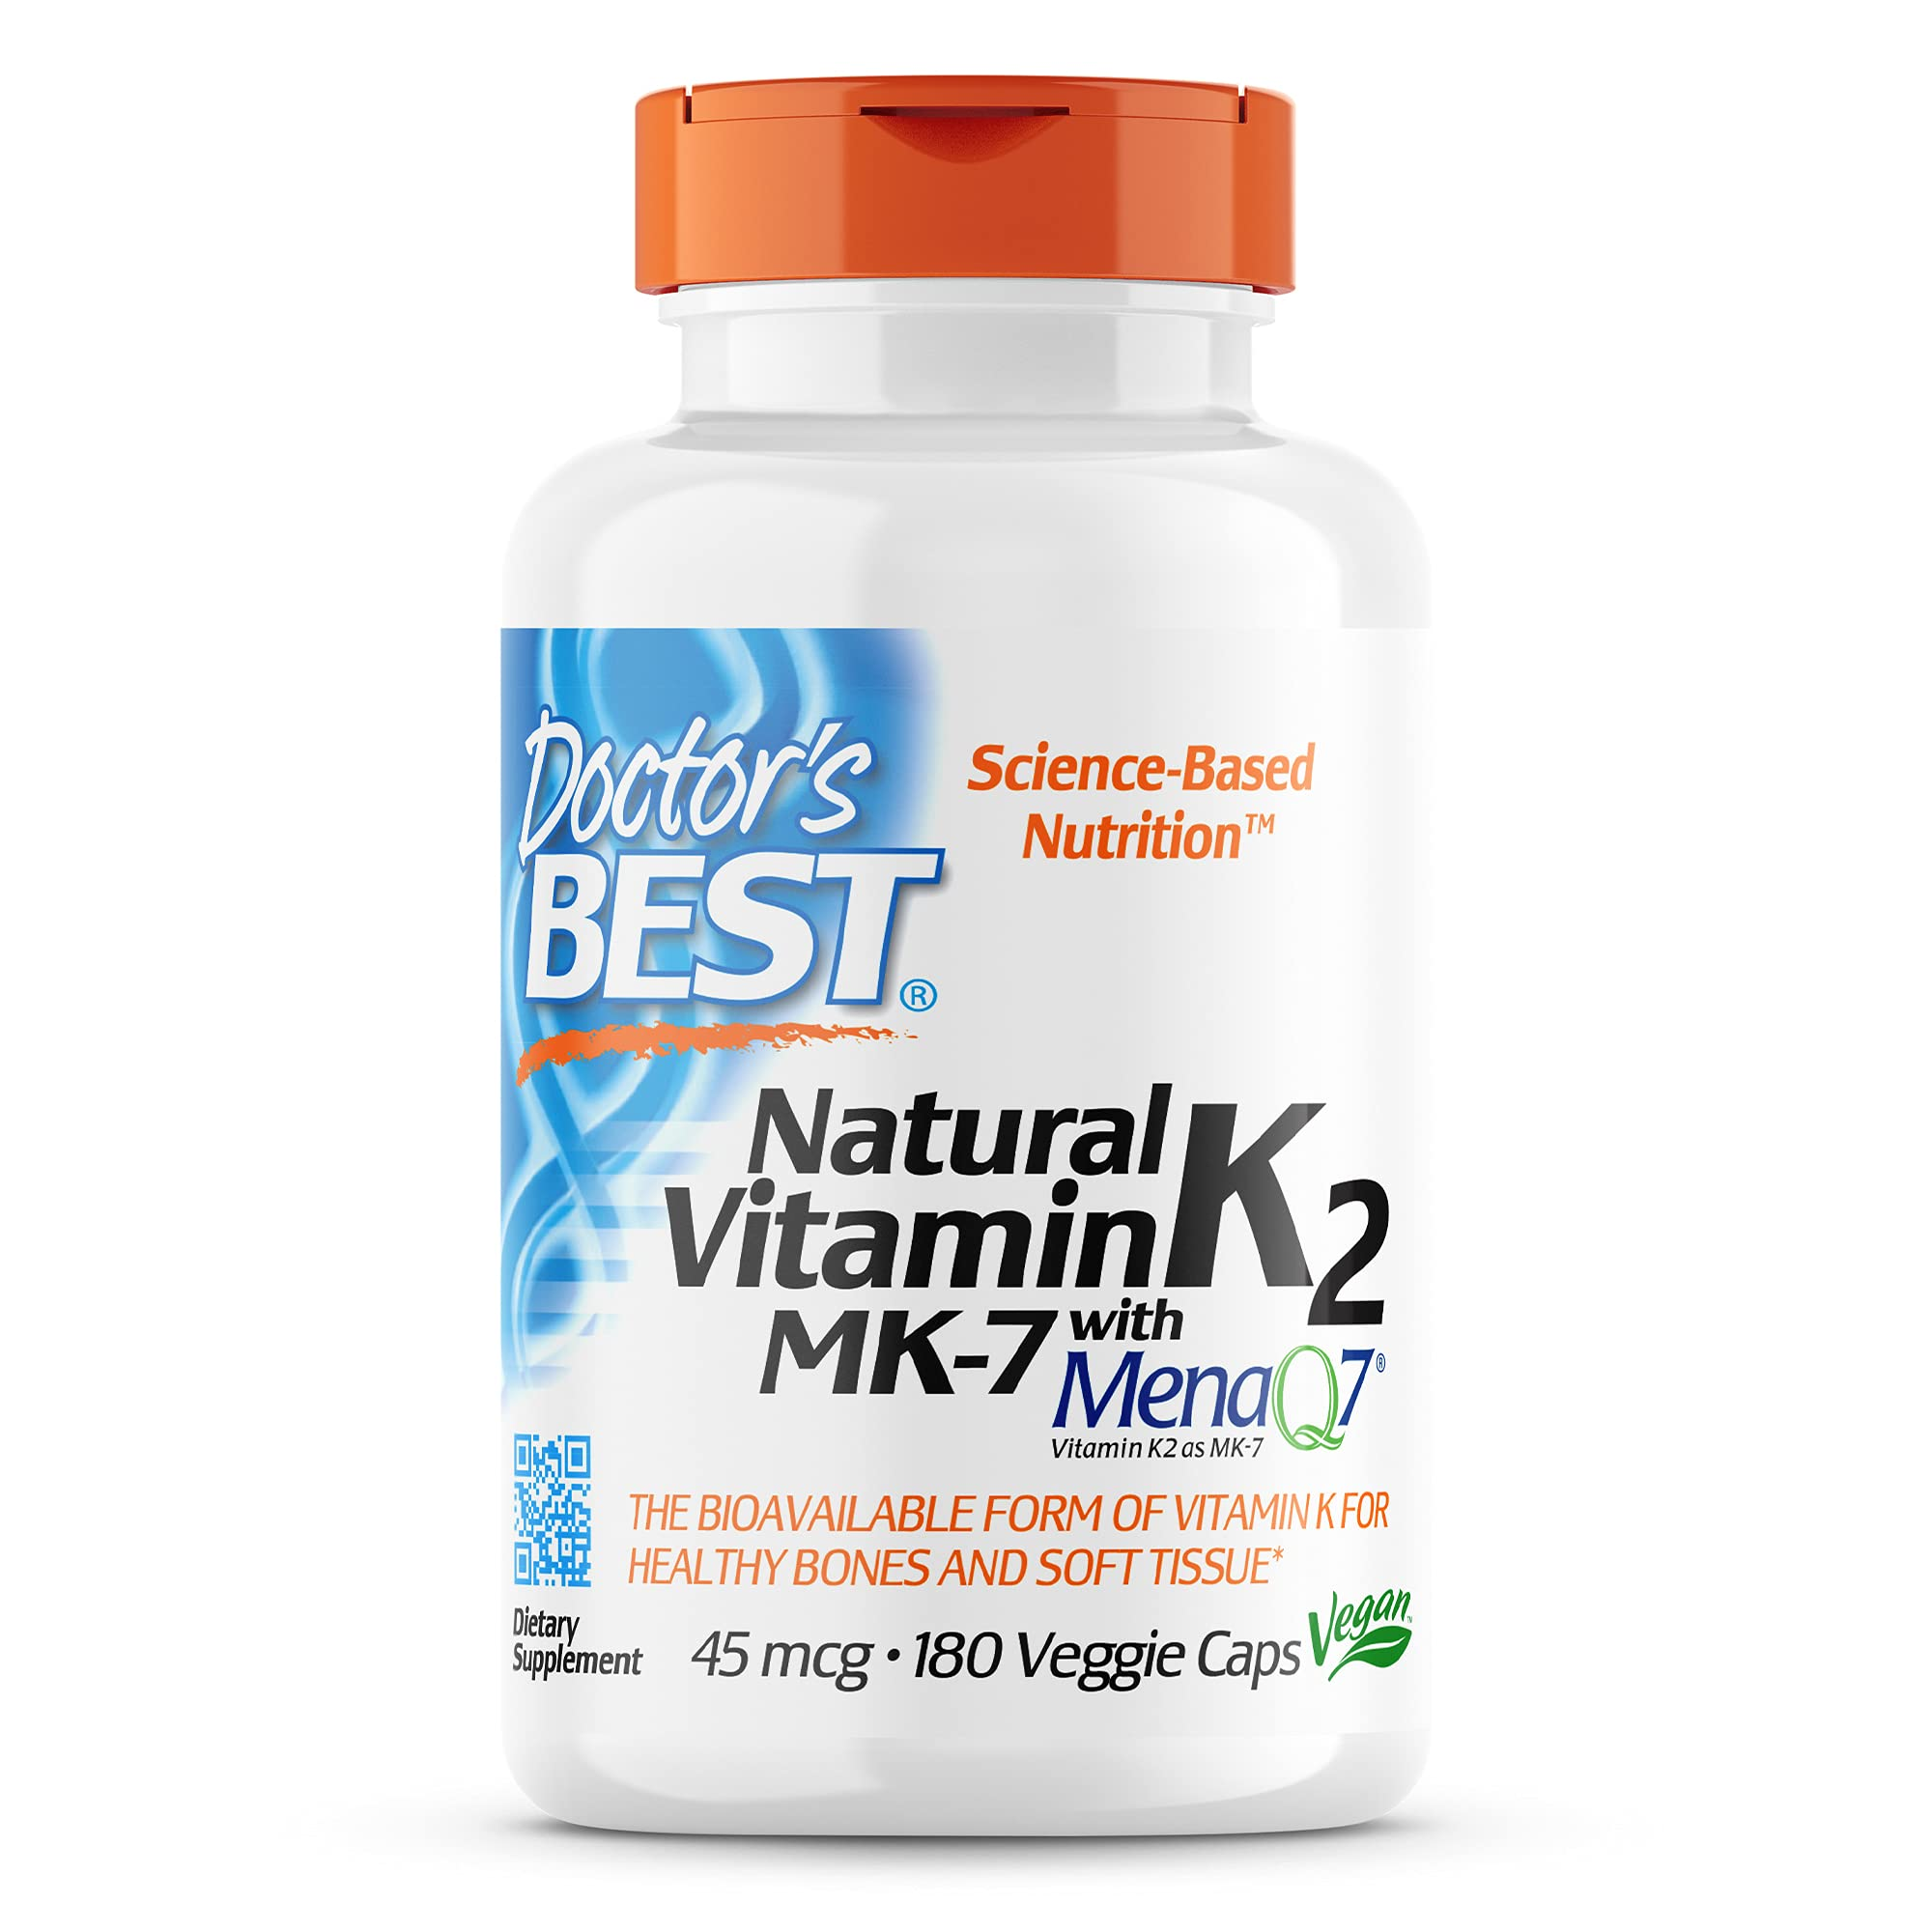 Doctor's Best Natural Vitamin K2 Mk-7, Supports Bone Health & Soft Tissue Elasticity, 180 Ct